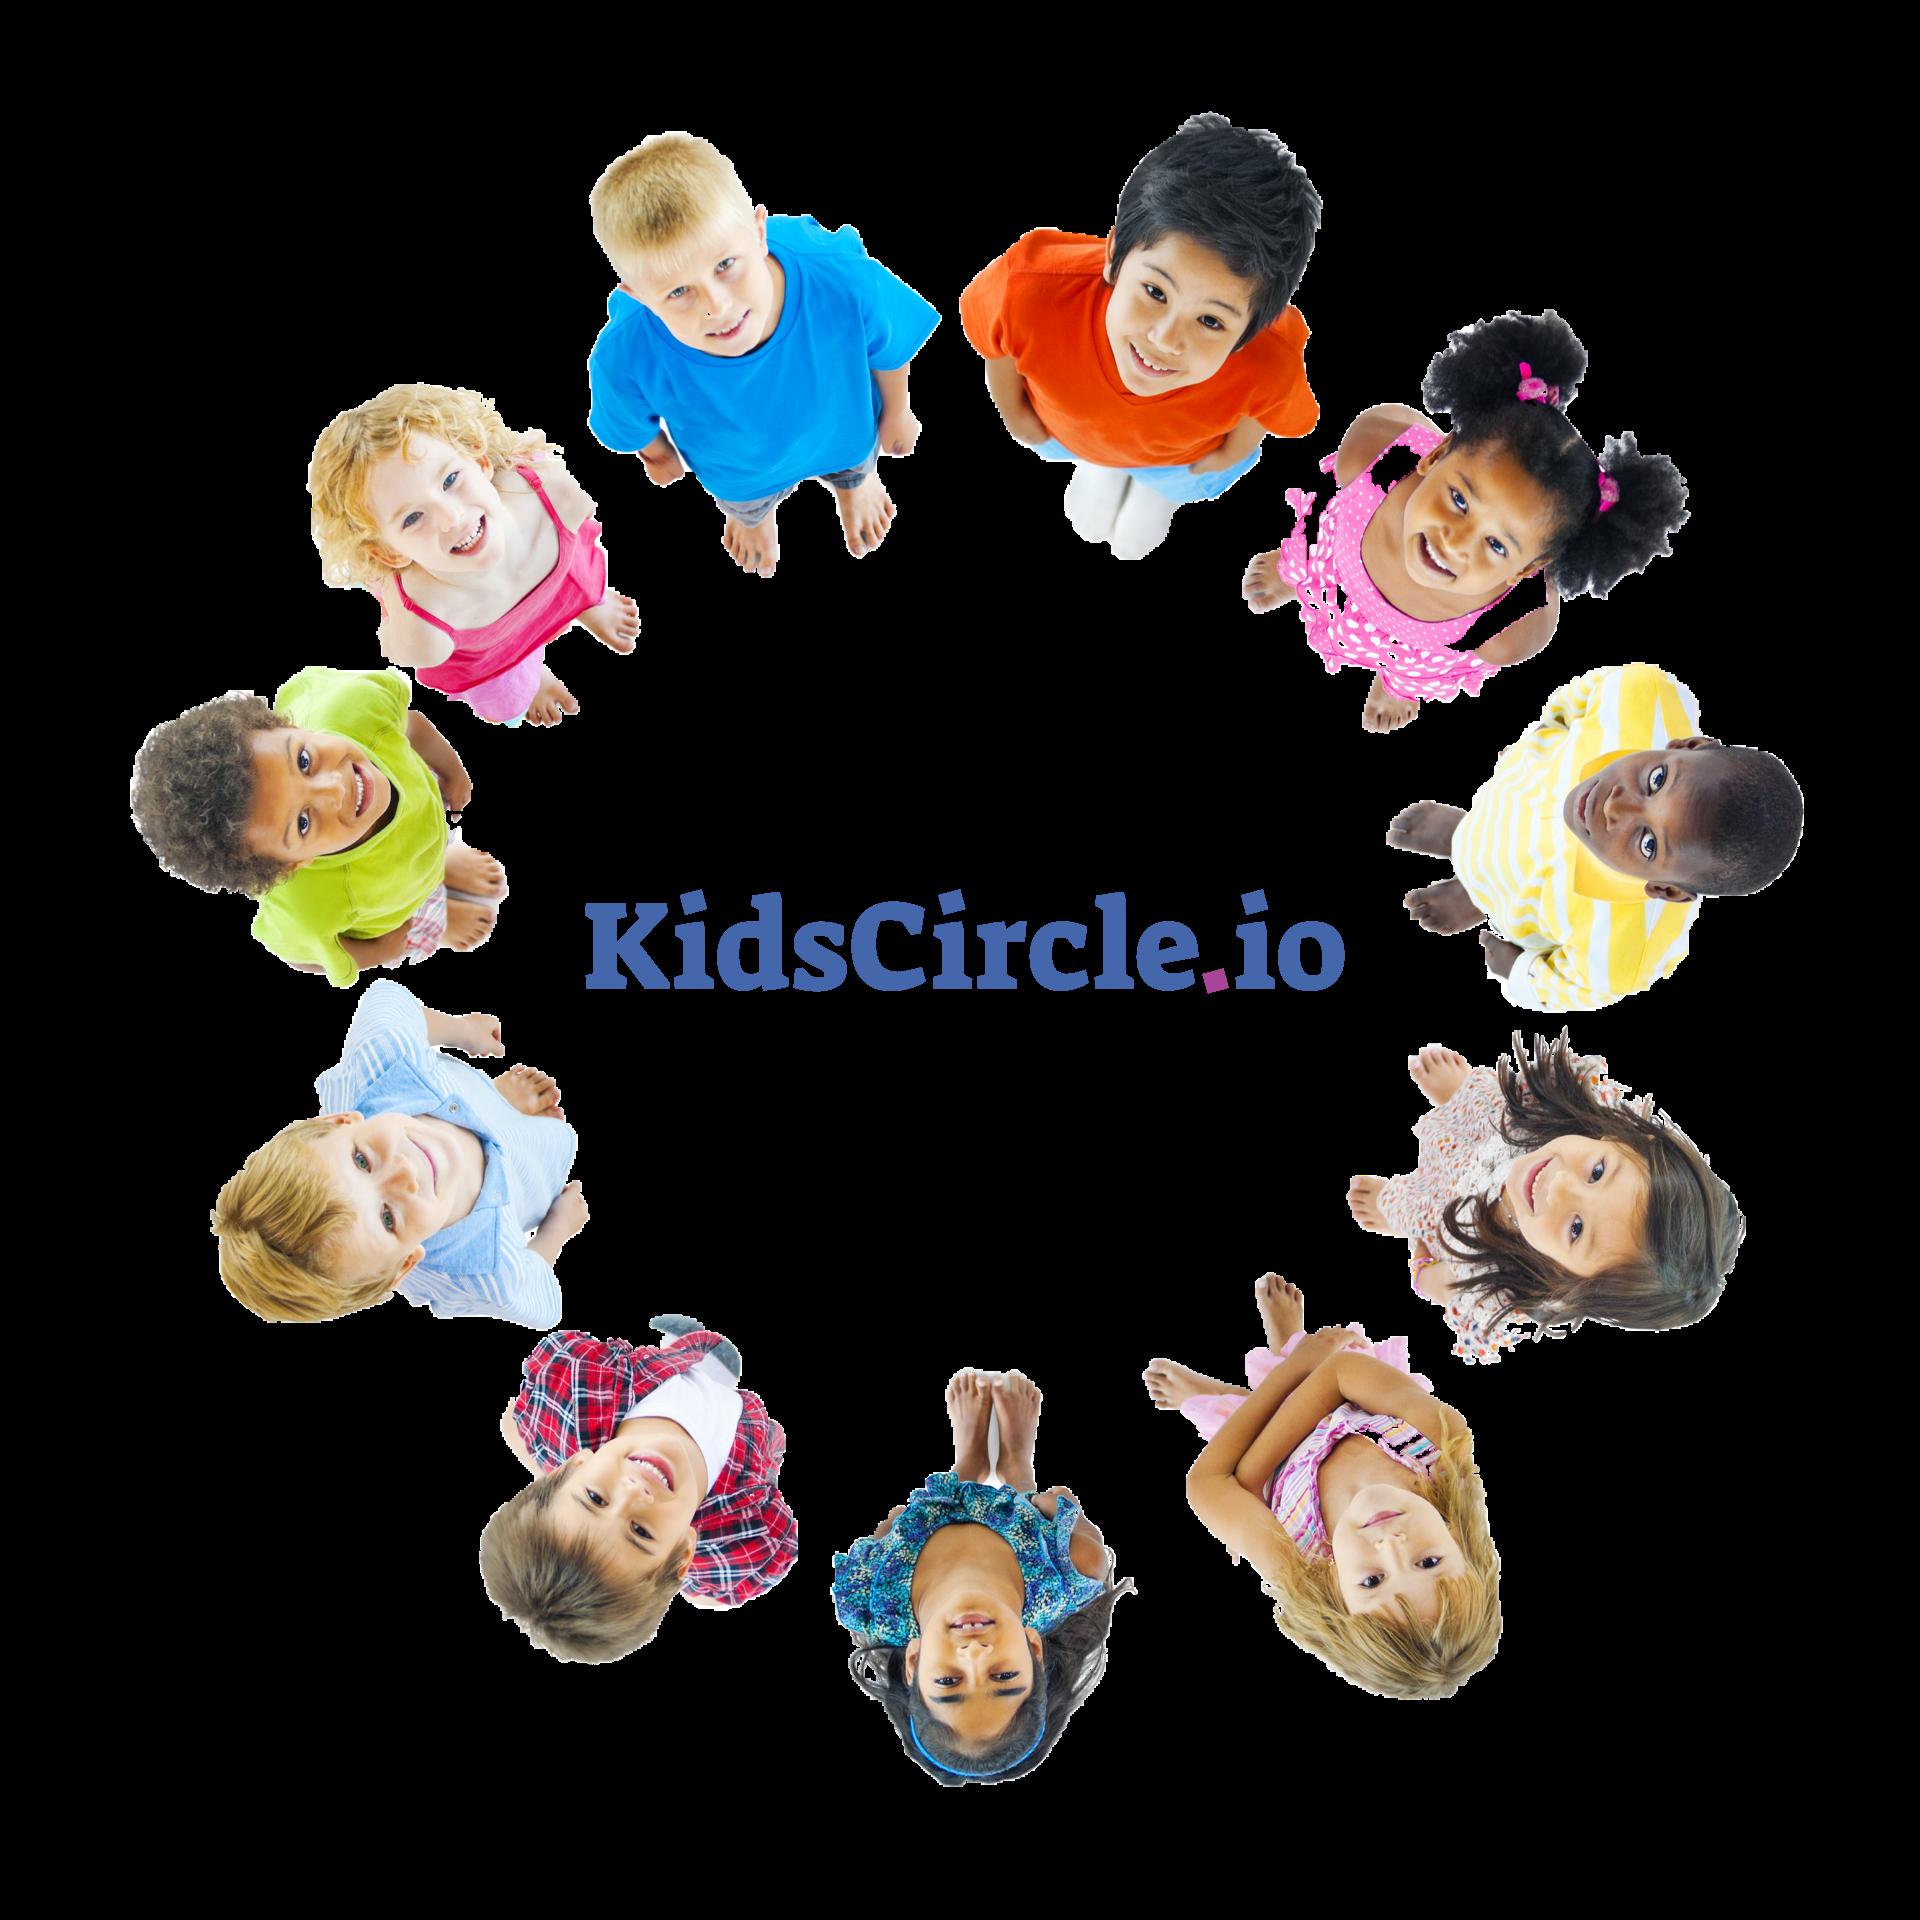 KidsCircle UG